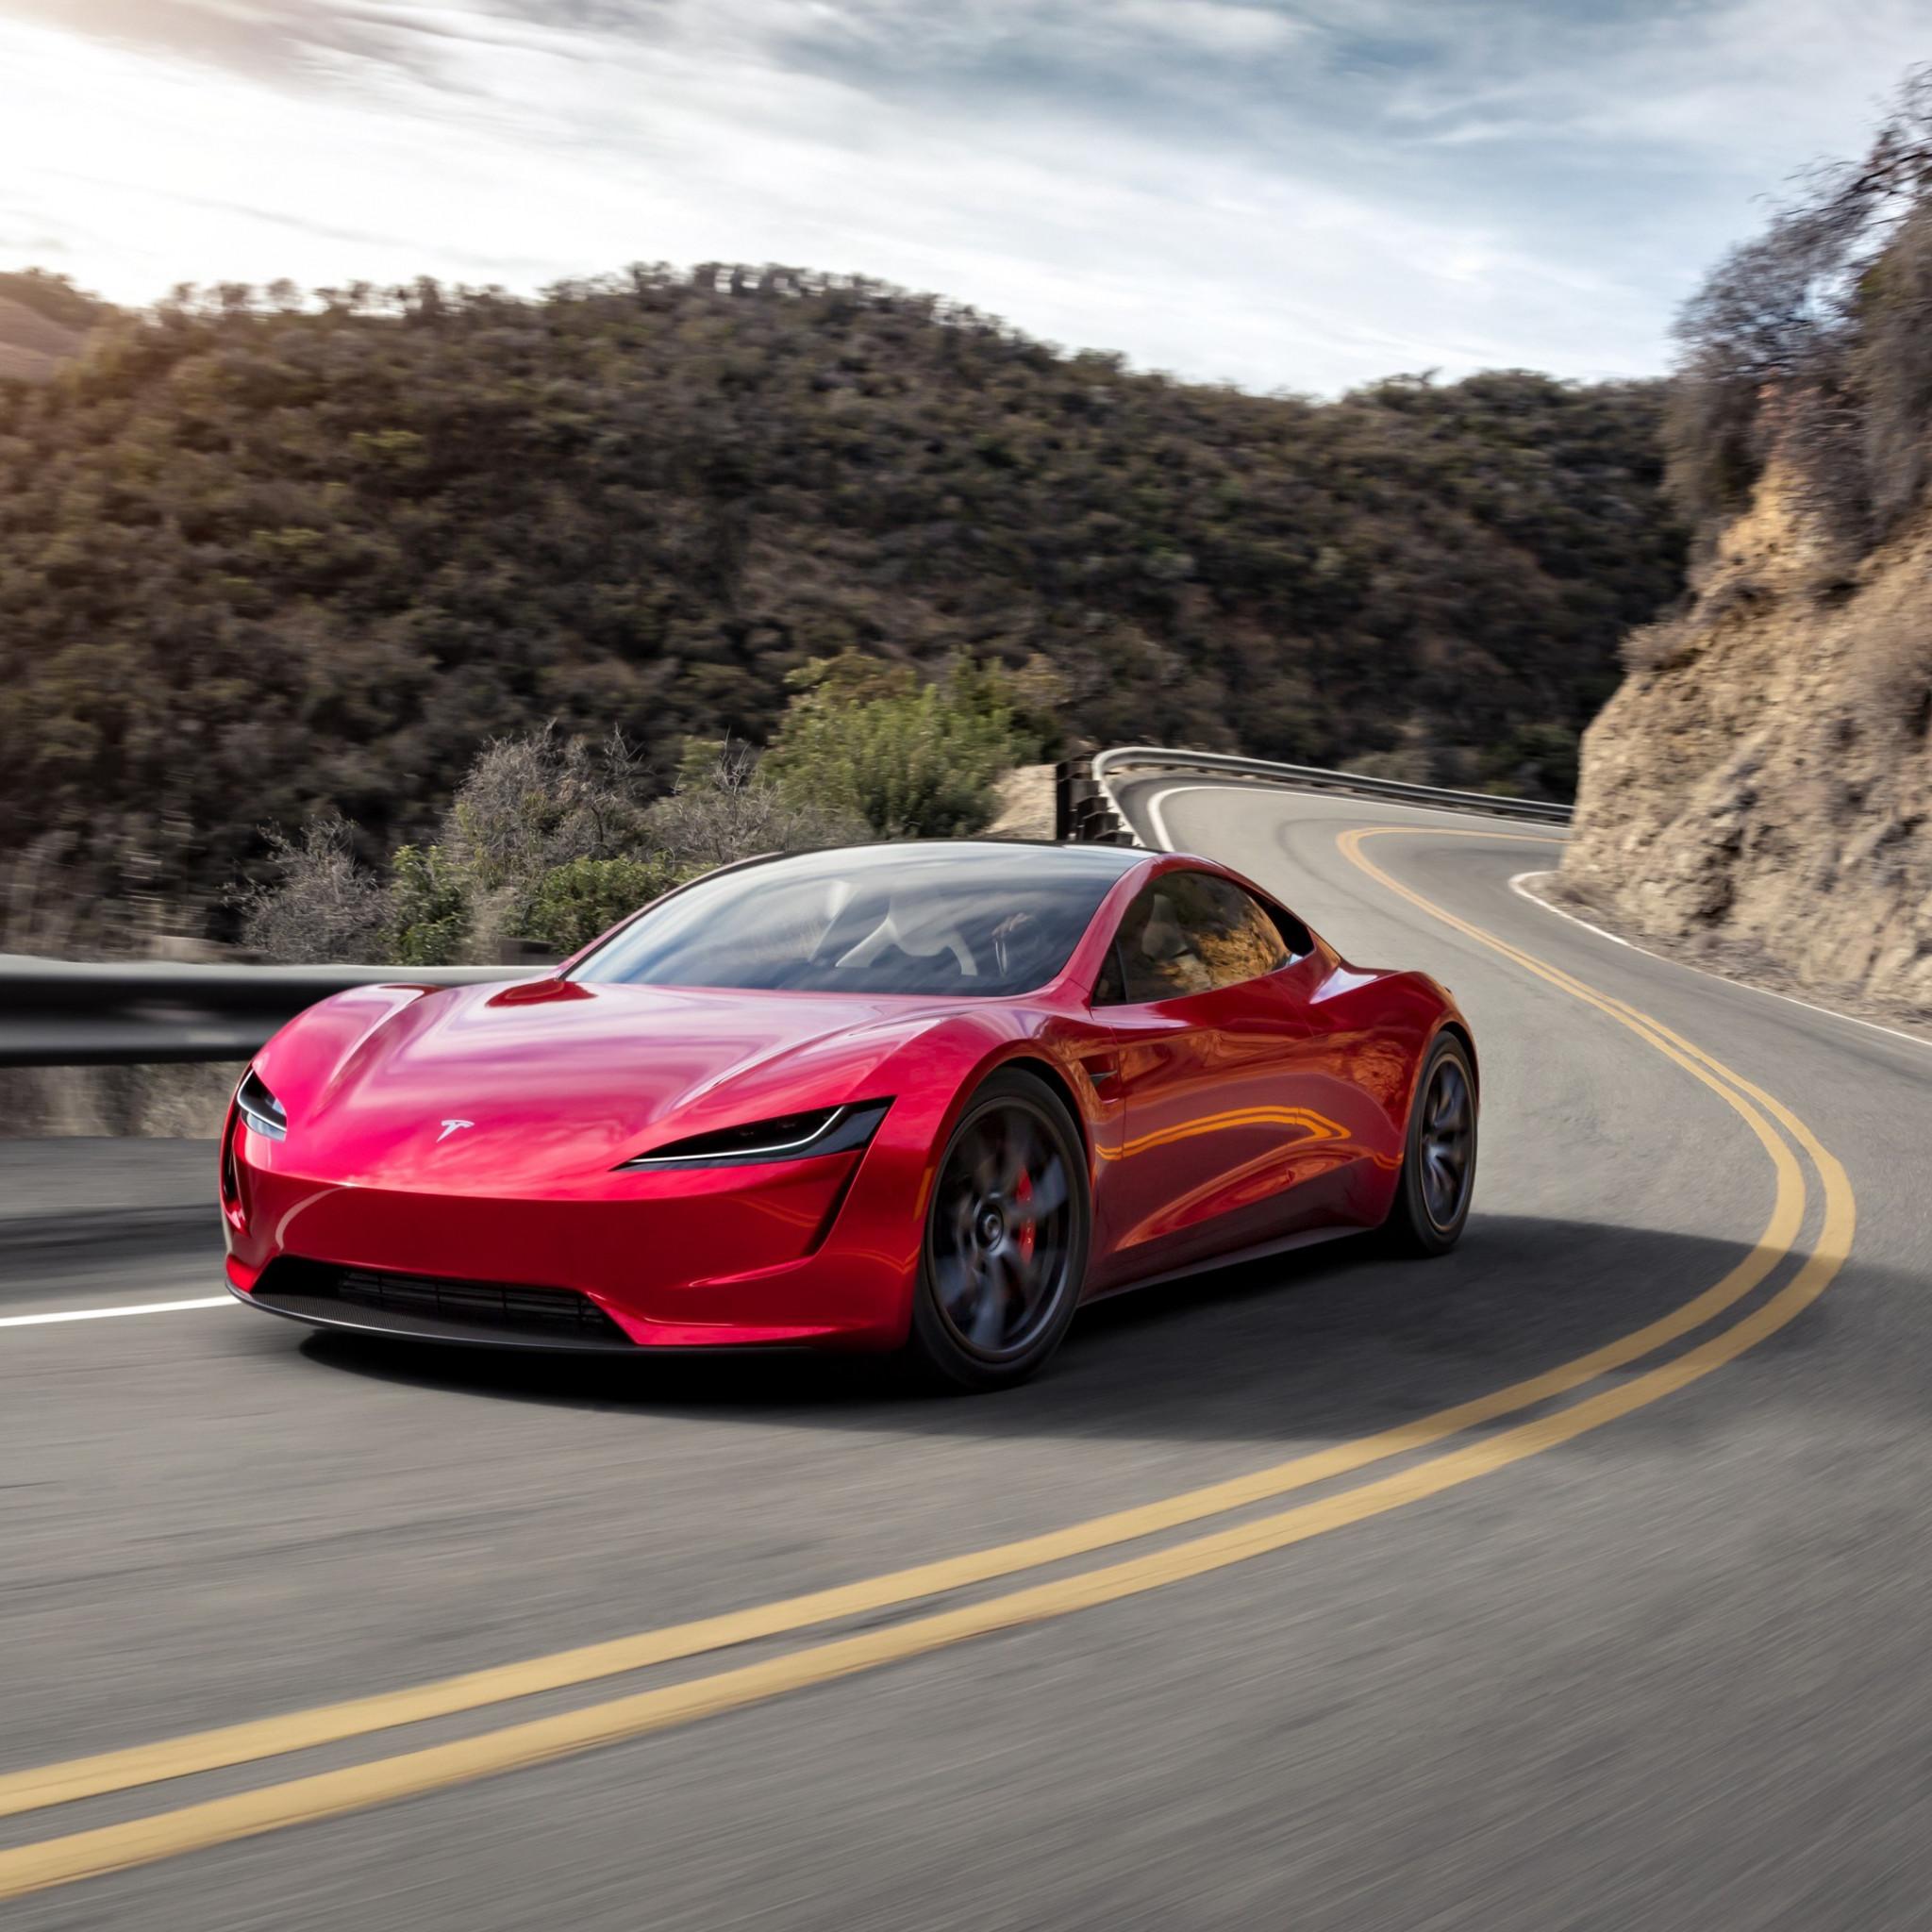 Download Wallpaper Tesla Roadster 2048x2048